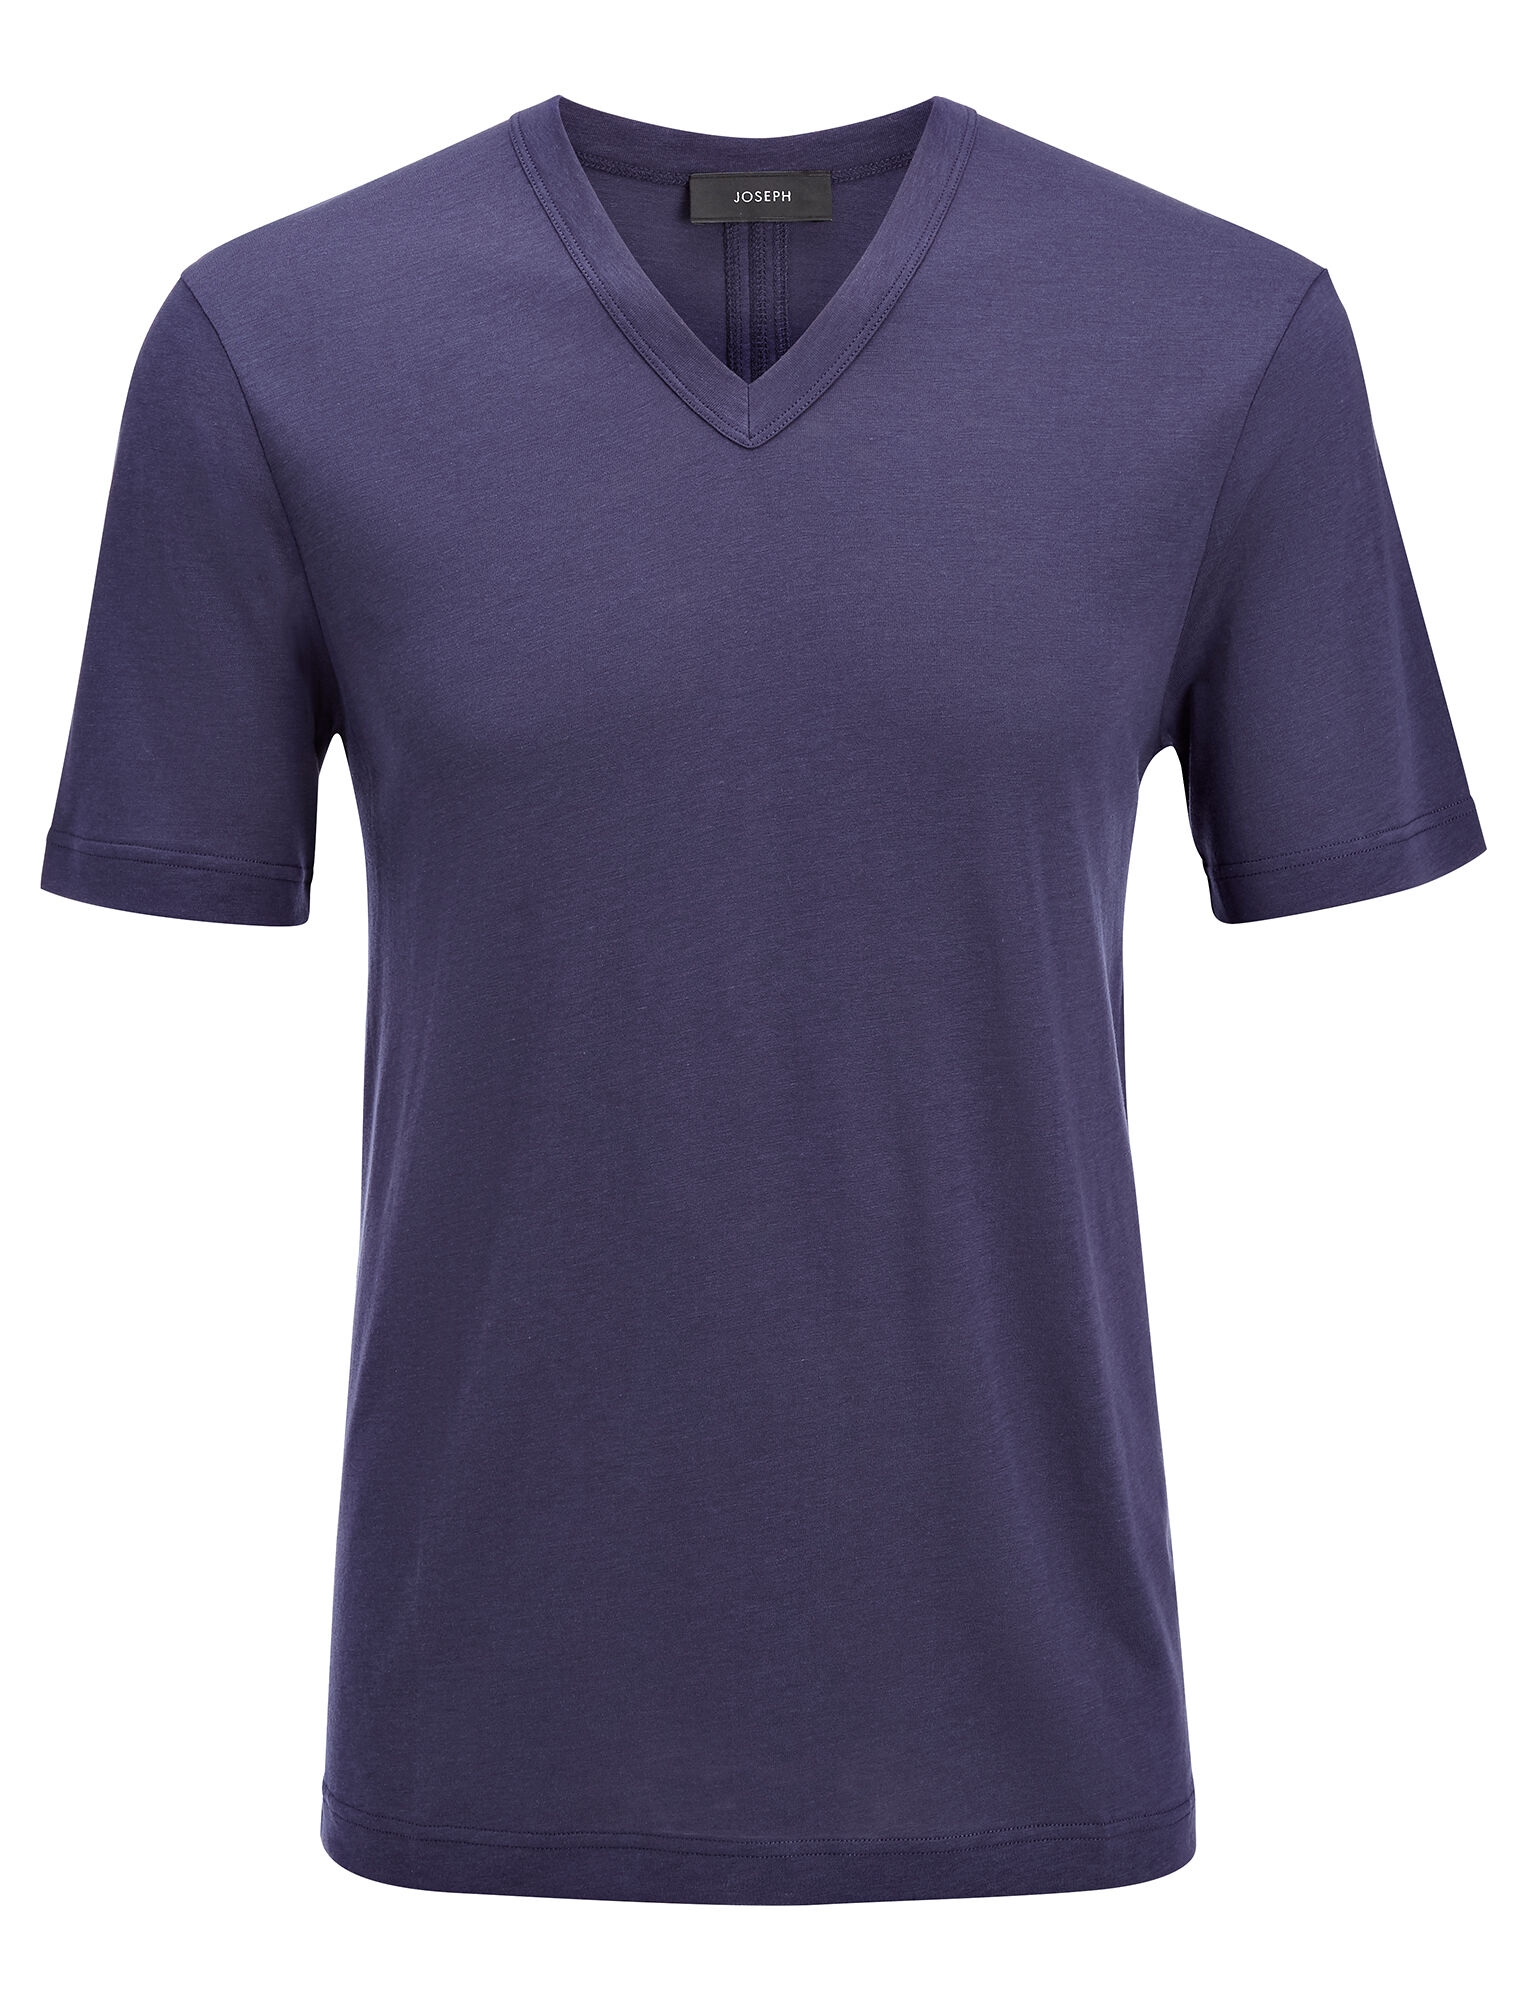 Joseph, Tee shirt col V en jersey de lyocell, in MARINE